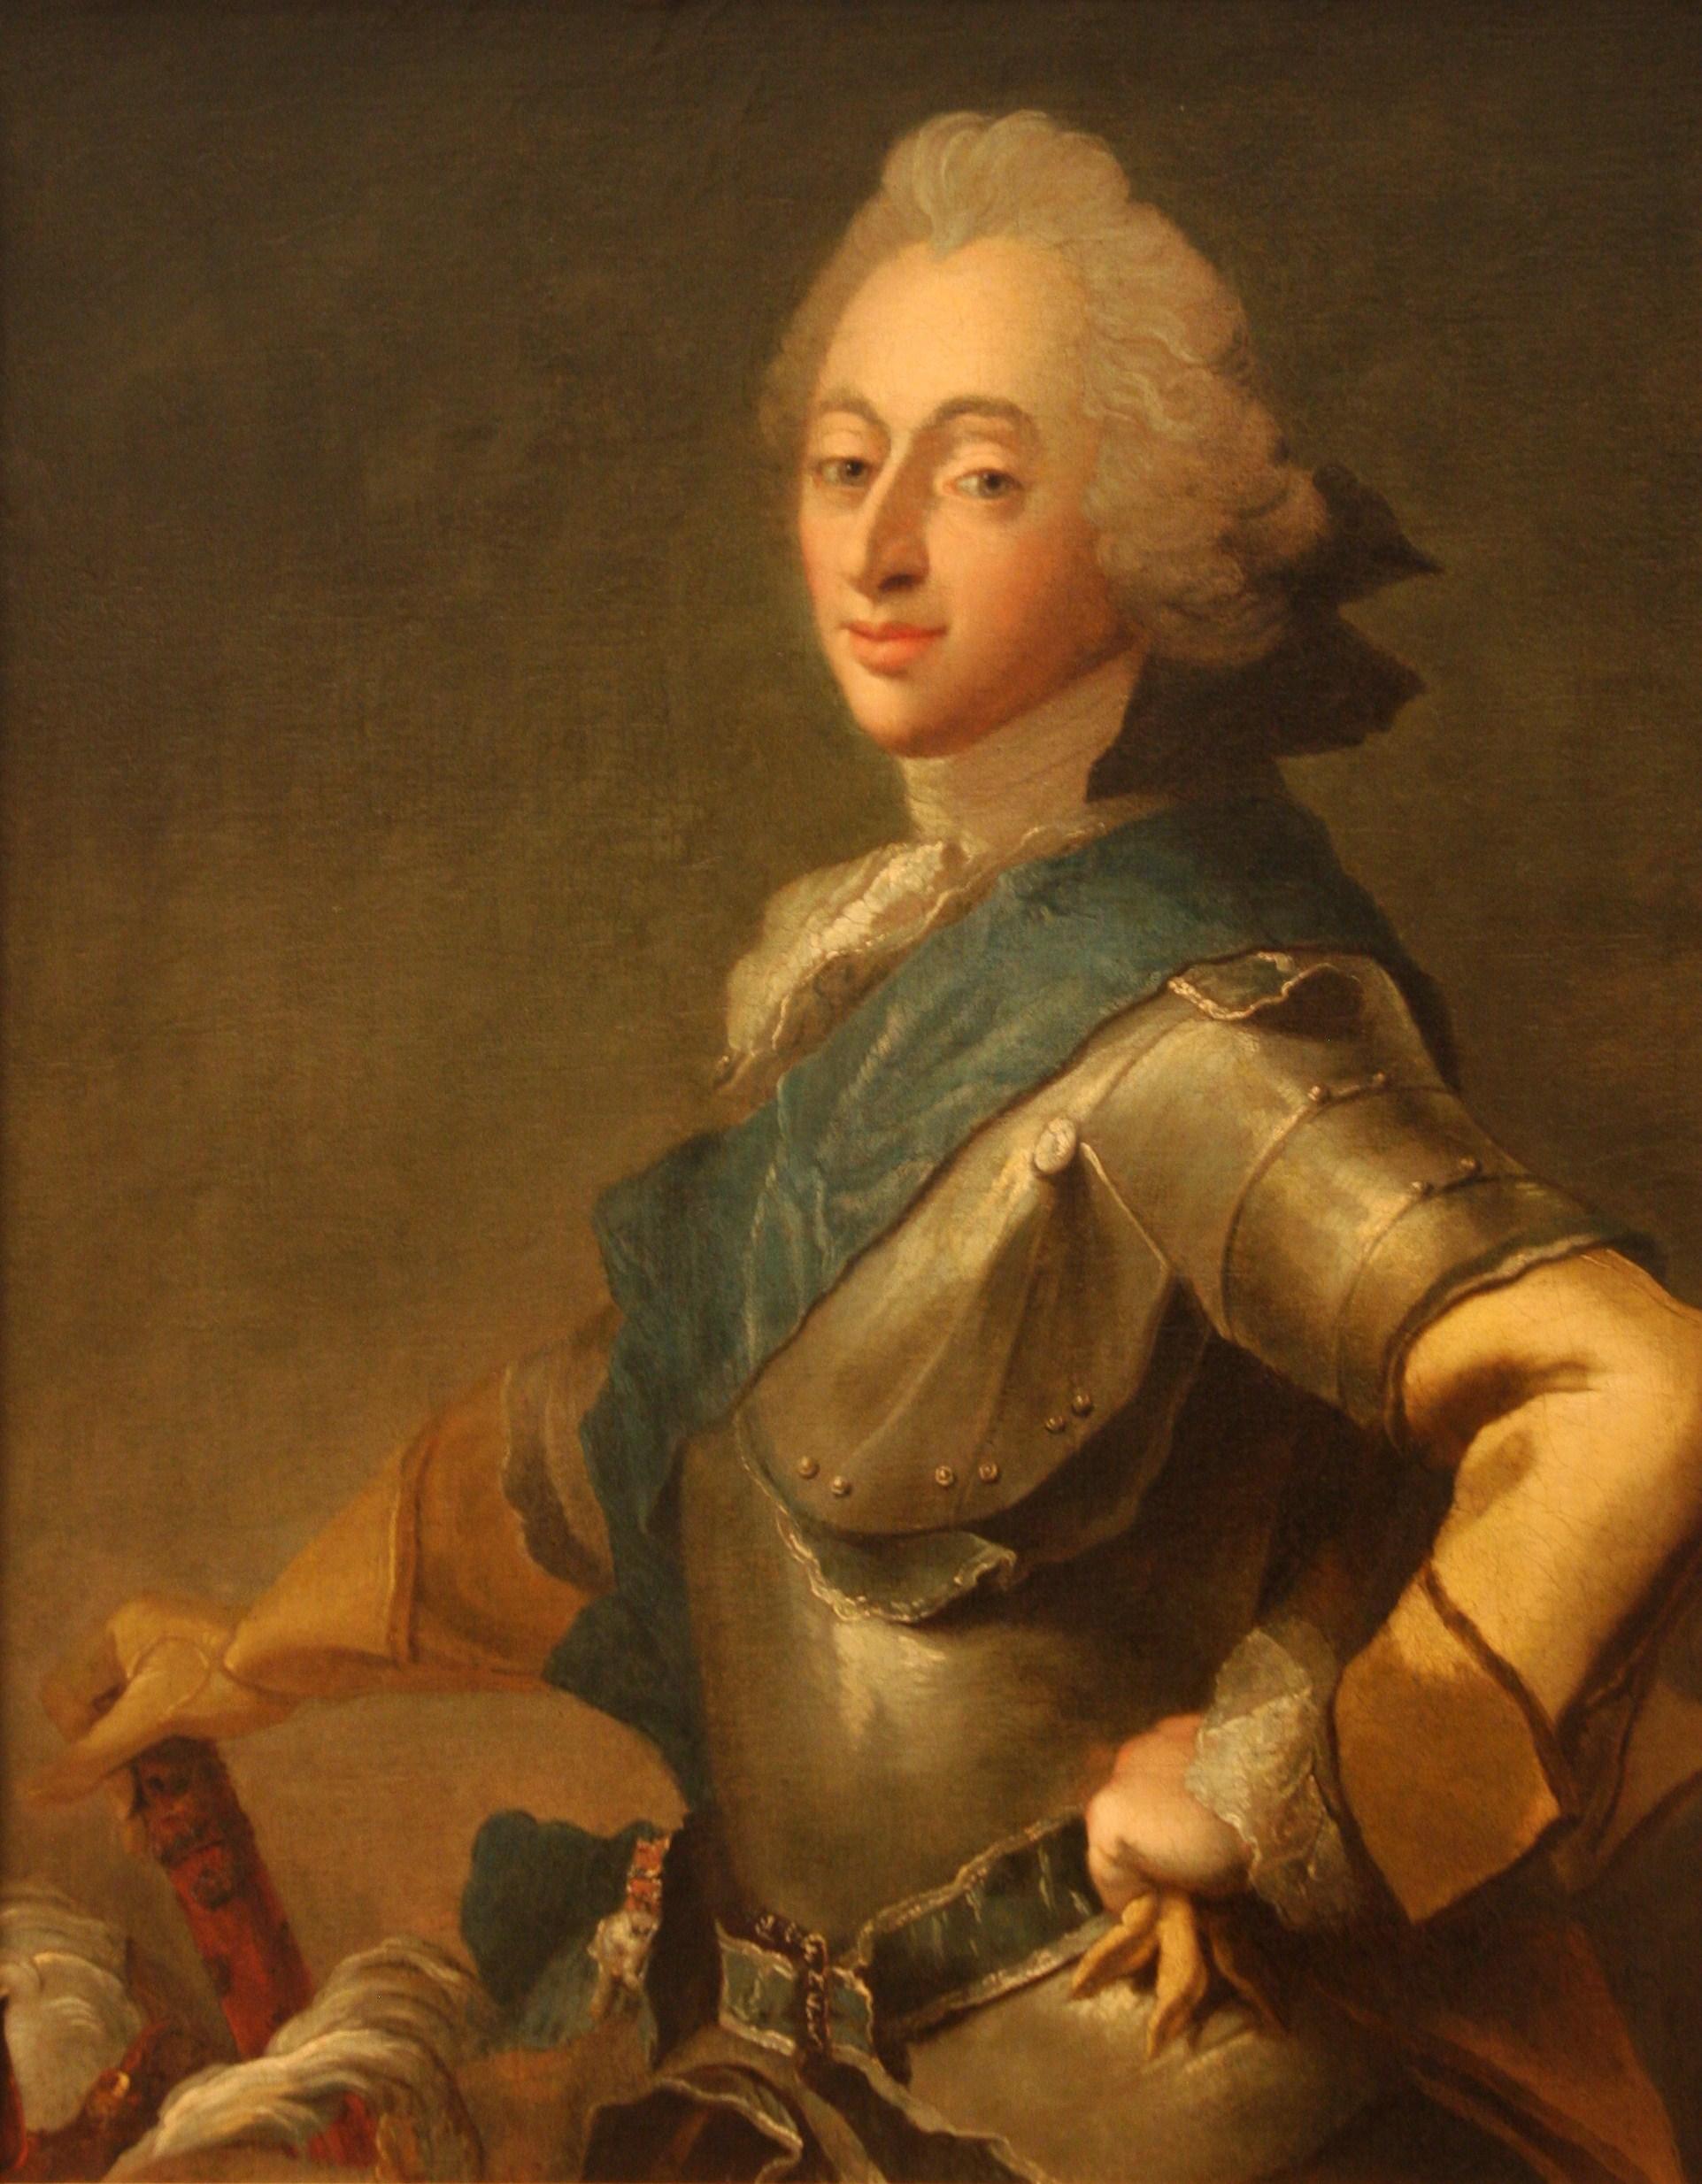 8 Pics & Art High Quality Goods # 1635 Caroline Of Monaco And Philippe Junot